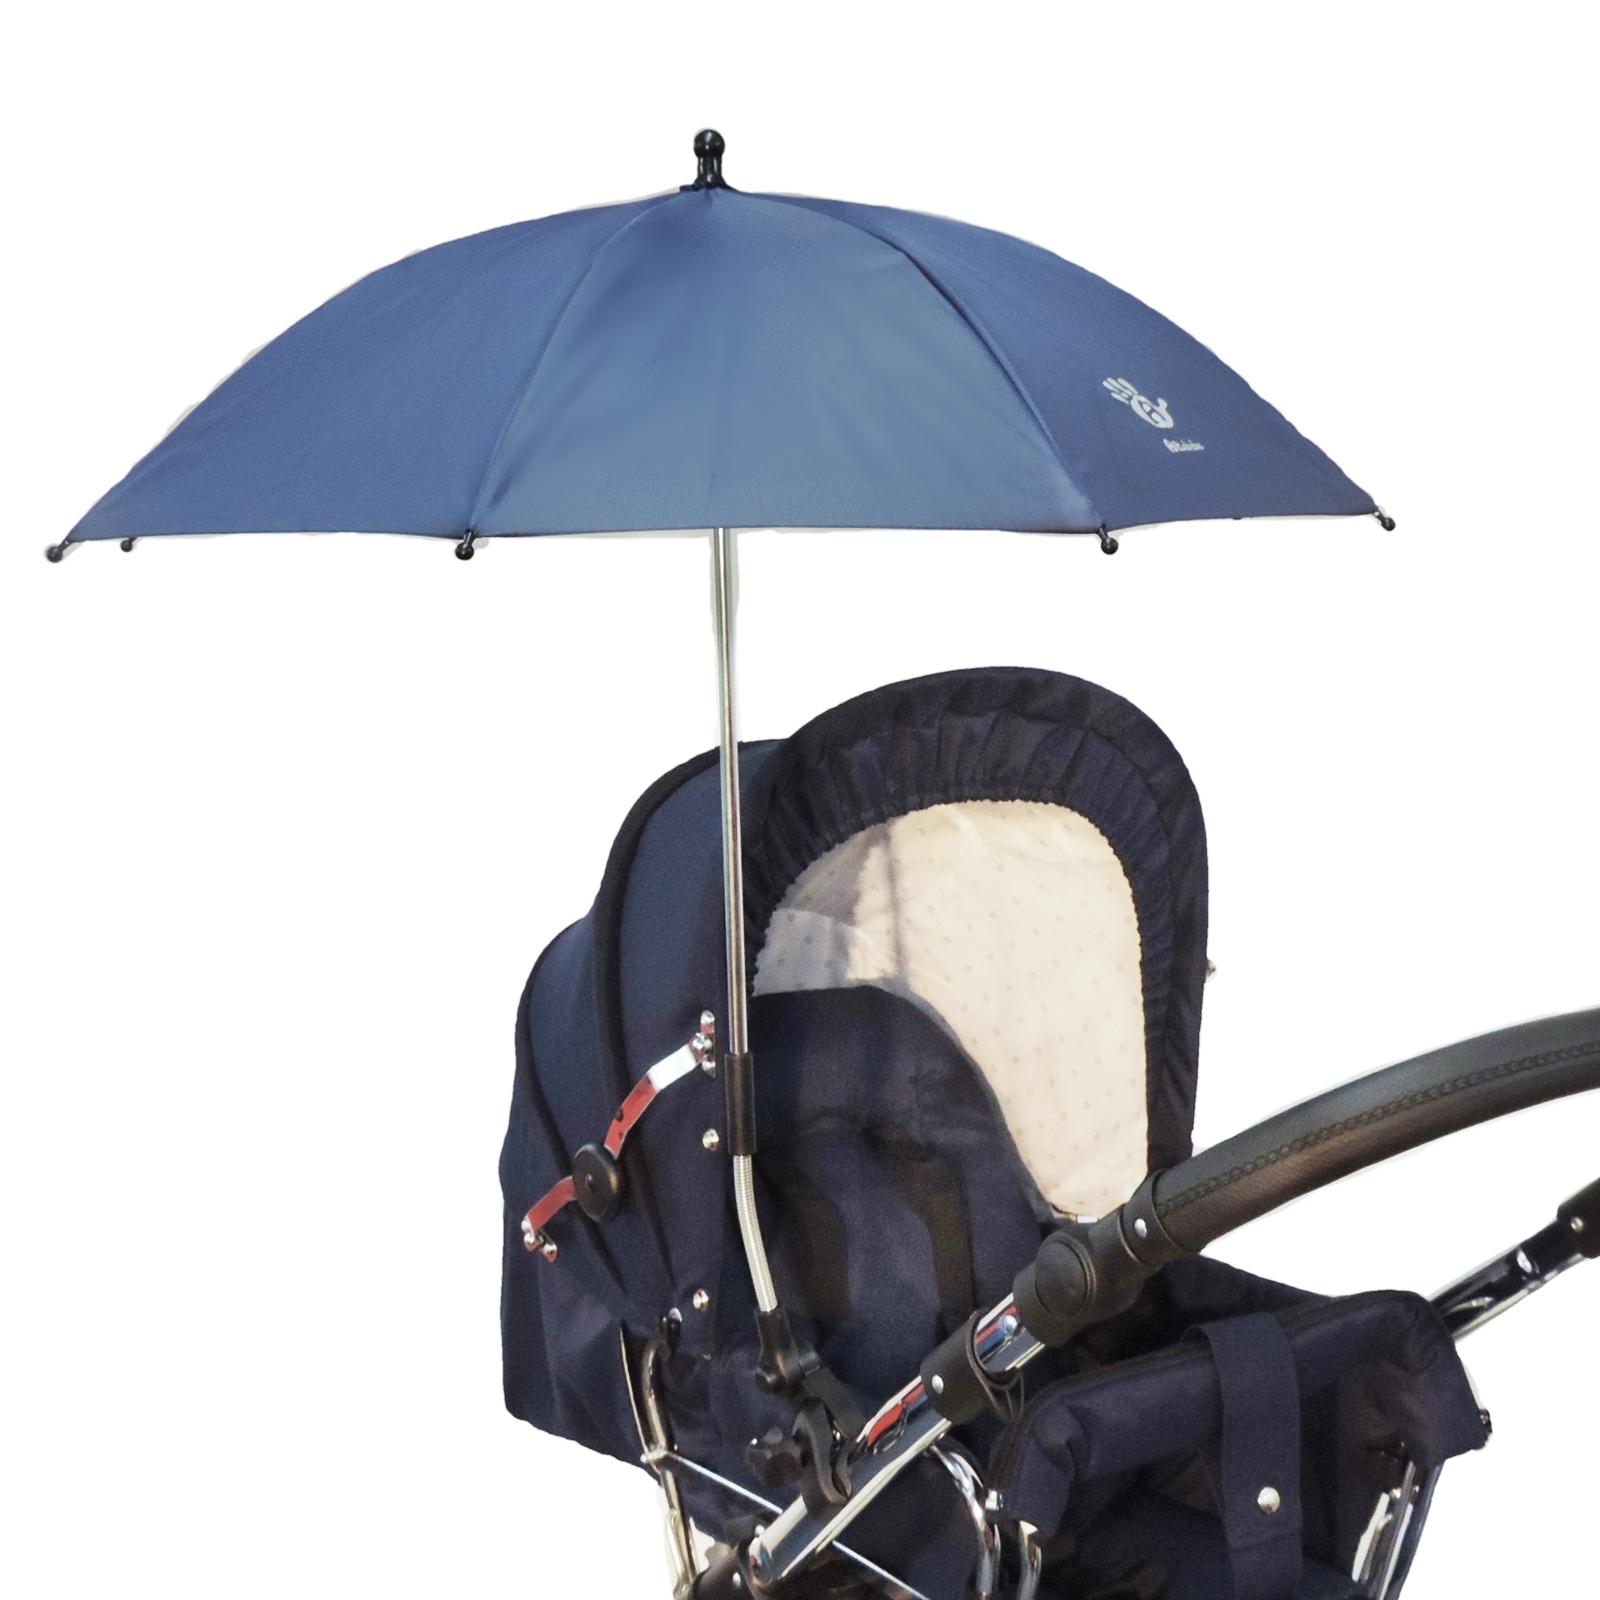 Kinderwagen Sommer-SET SOMMERFUßSACK SONNENSCHIRM Schirm Fußsack Buggy Kinder